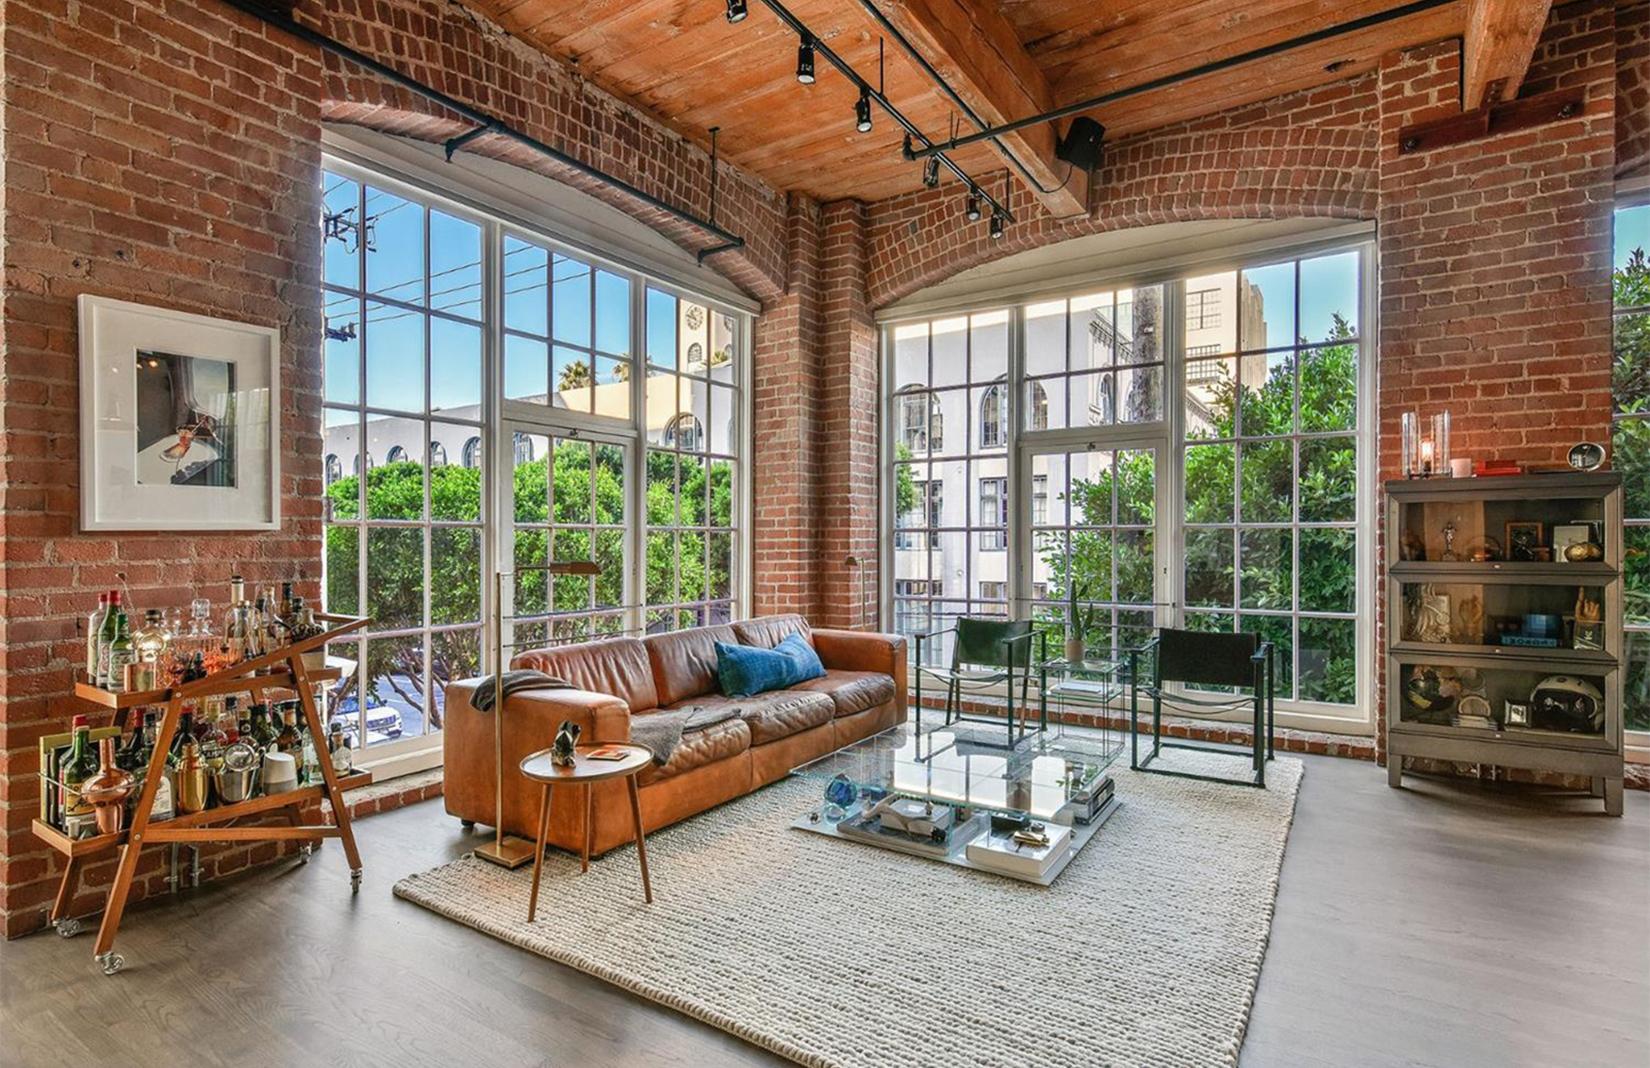 355 Bryant Street loft for sale in San Francisco